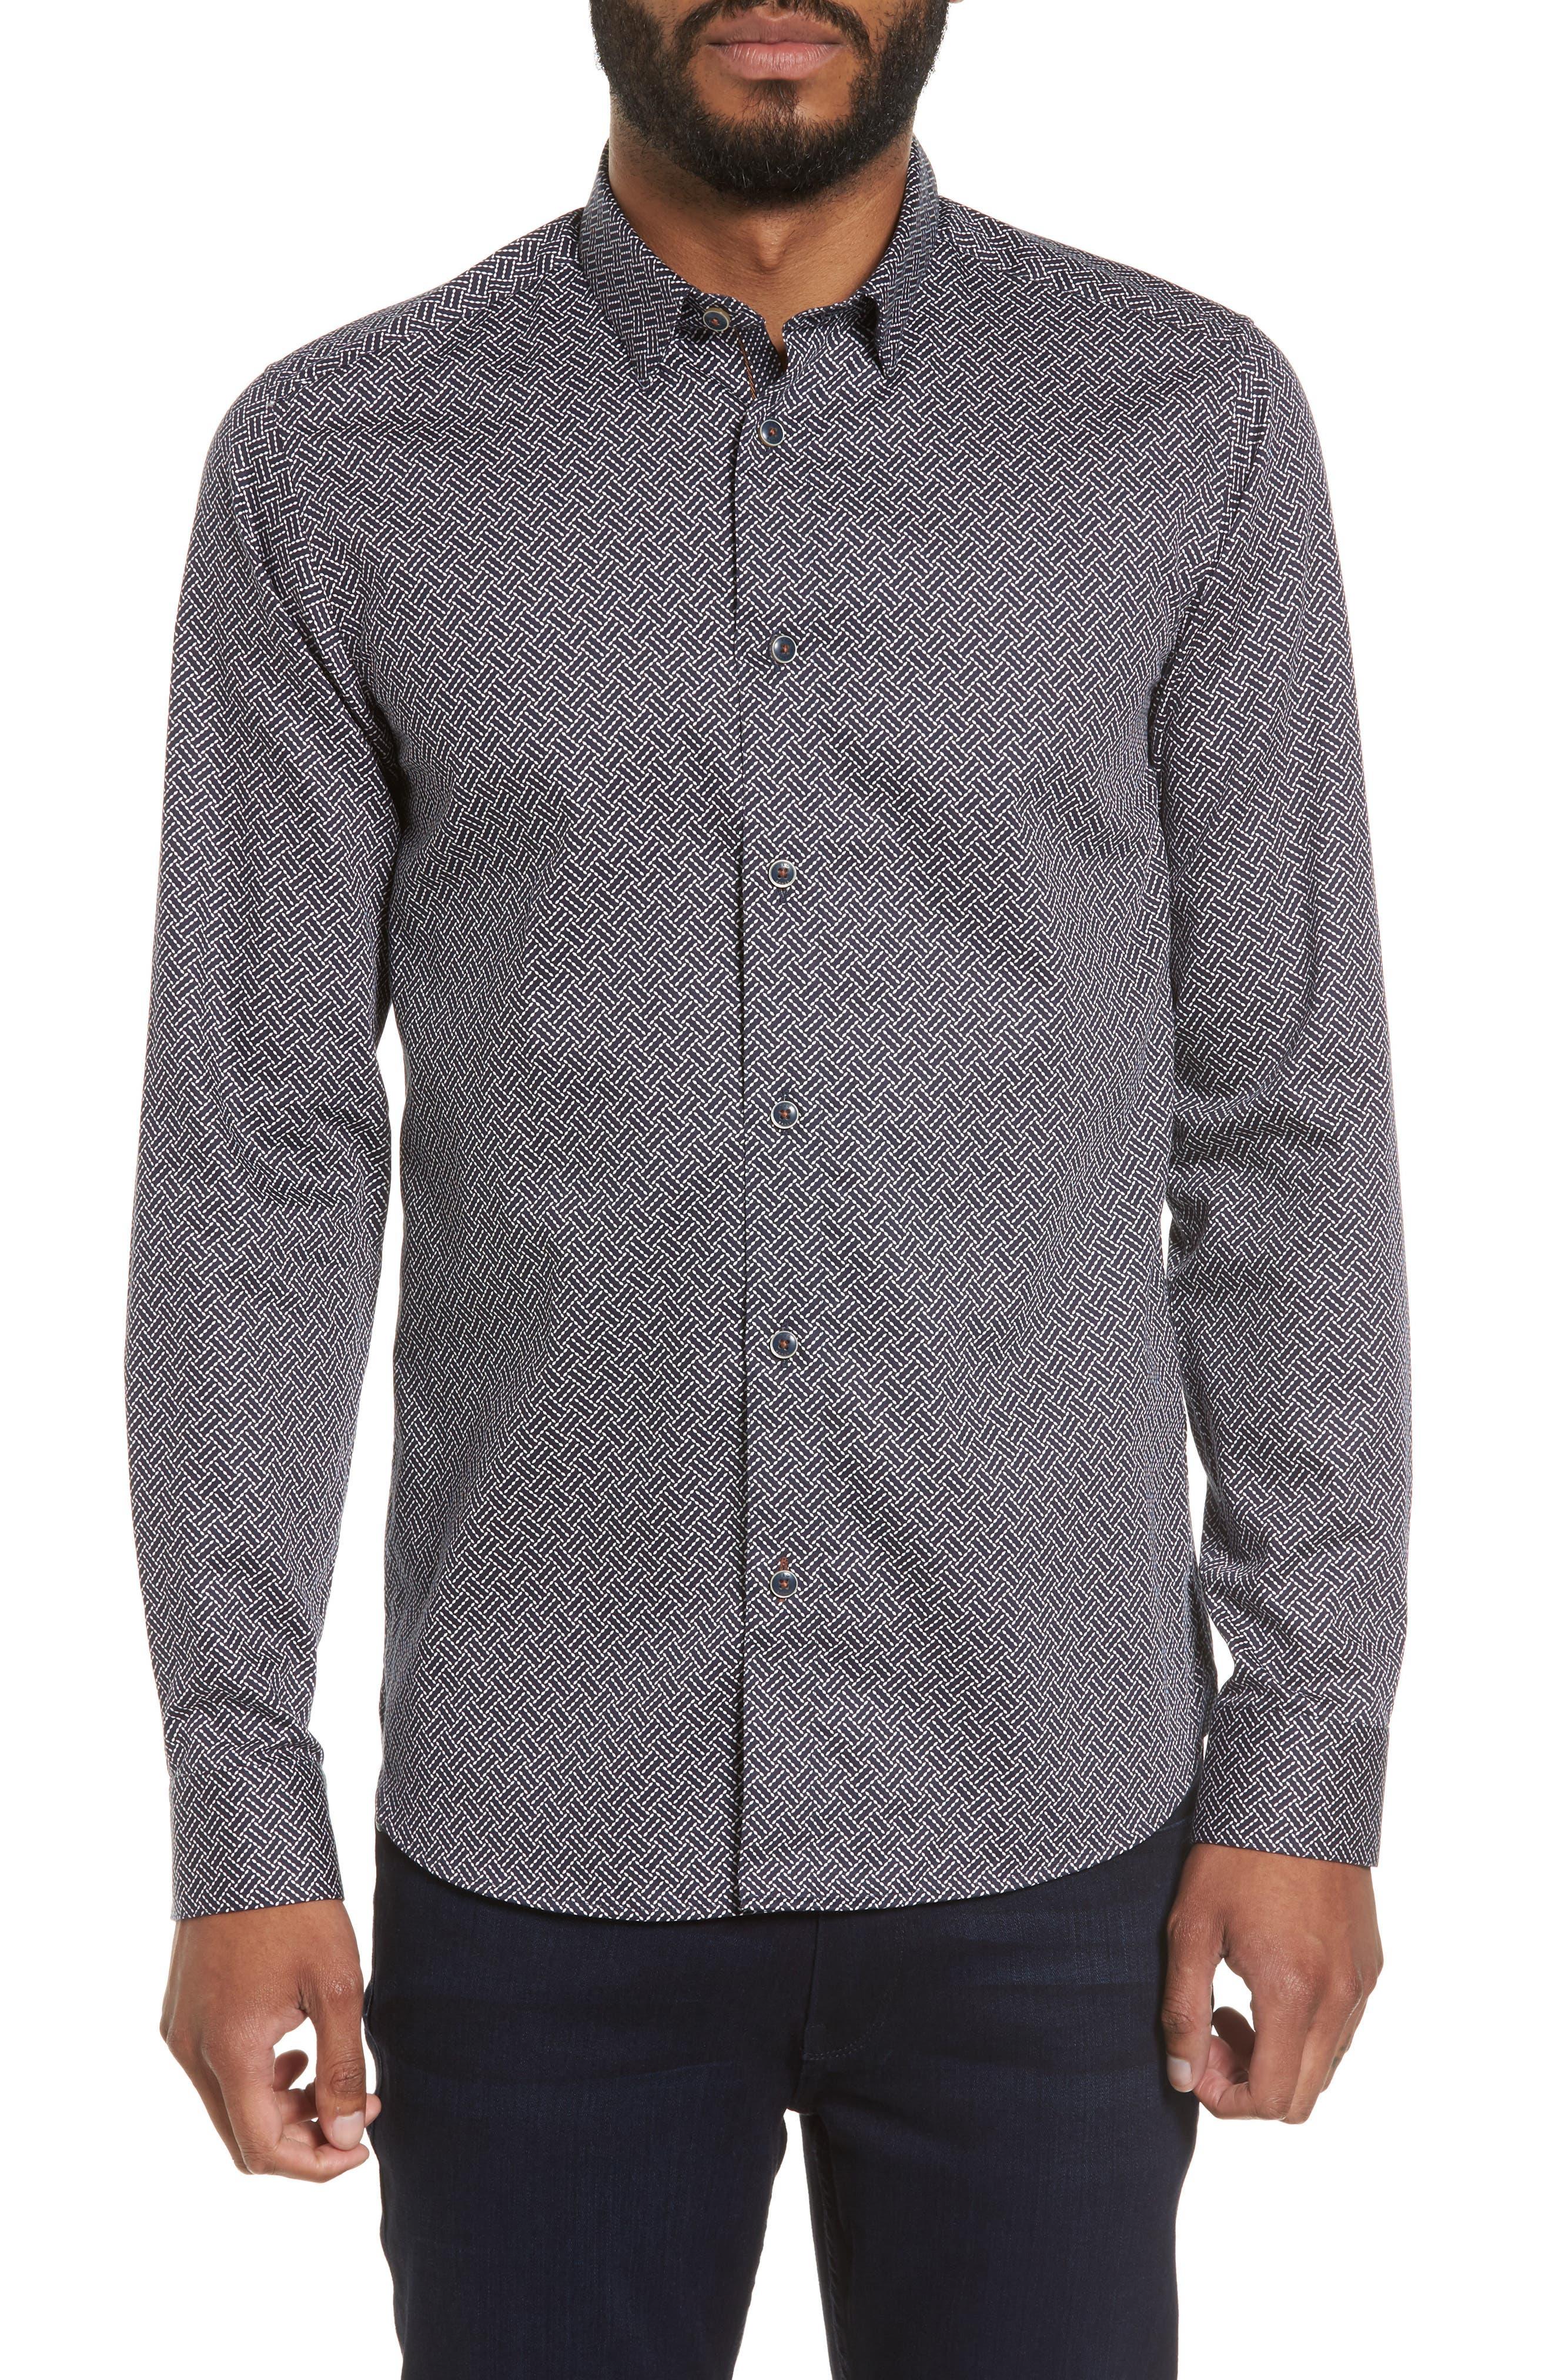 Larosh Slim Fit Basket Weave Print Sport Shirt,                             Main thumbnail 1, color,                             Navy